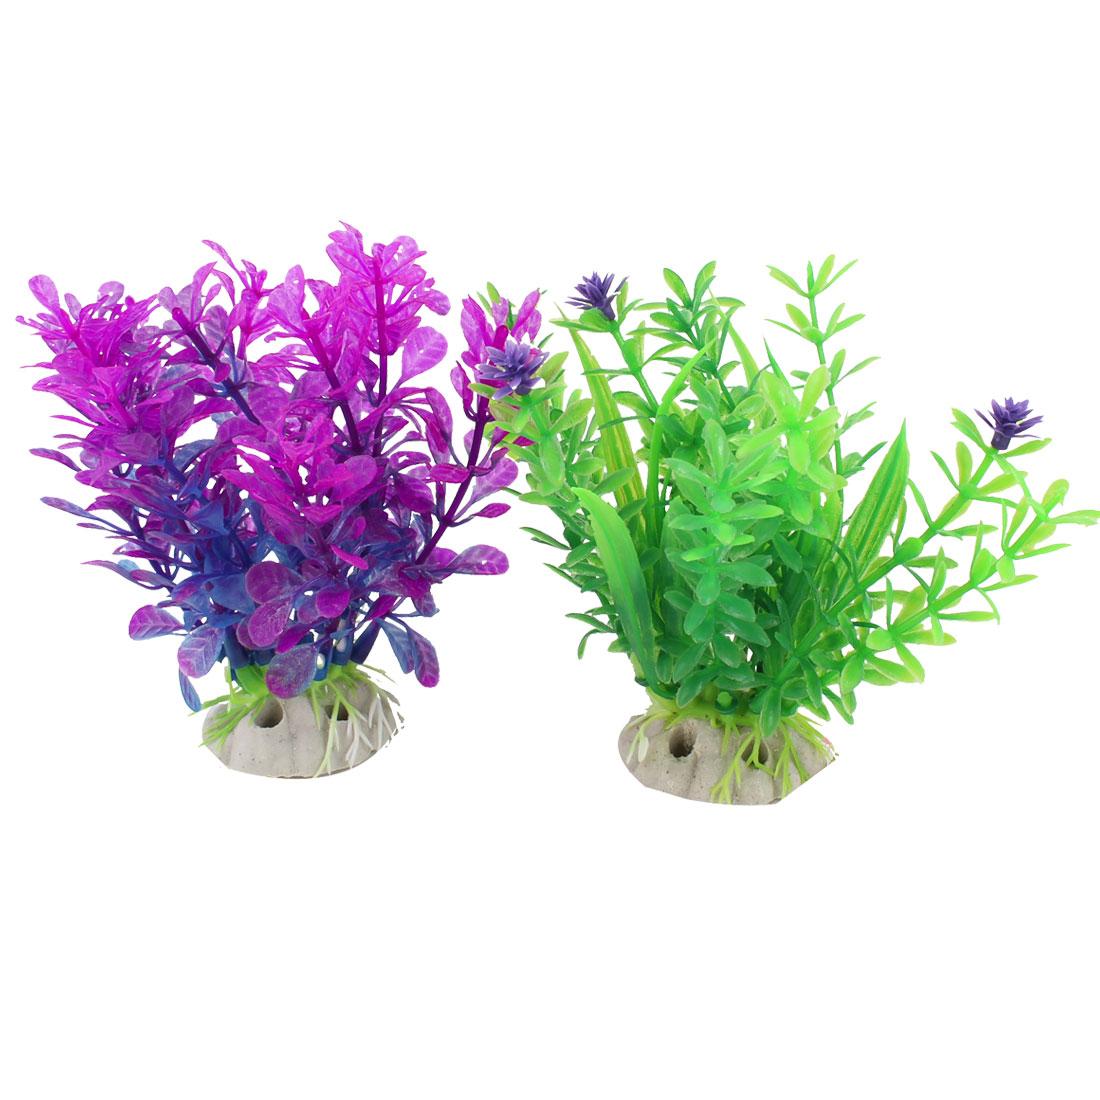 "2 Pcs 4.3"" Height Fuchsia Green Artificial Underwater Grass for Fish Tank"